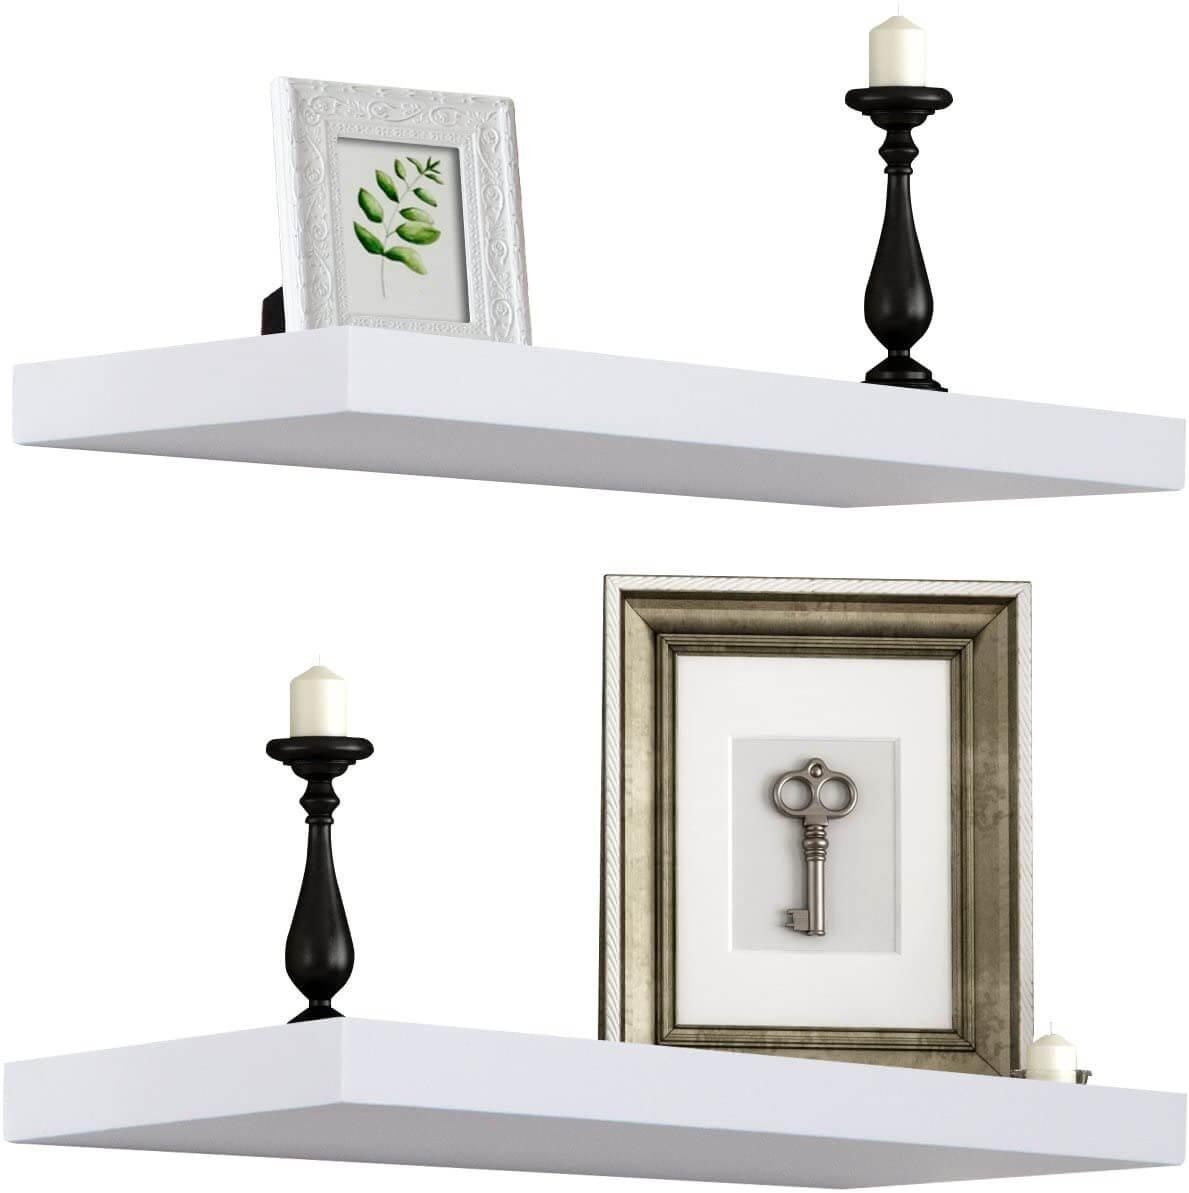 Sorbus Floating Shelf — Hanging Wall Shelves Decoration (extra long)